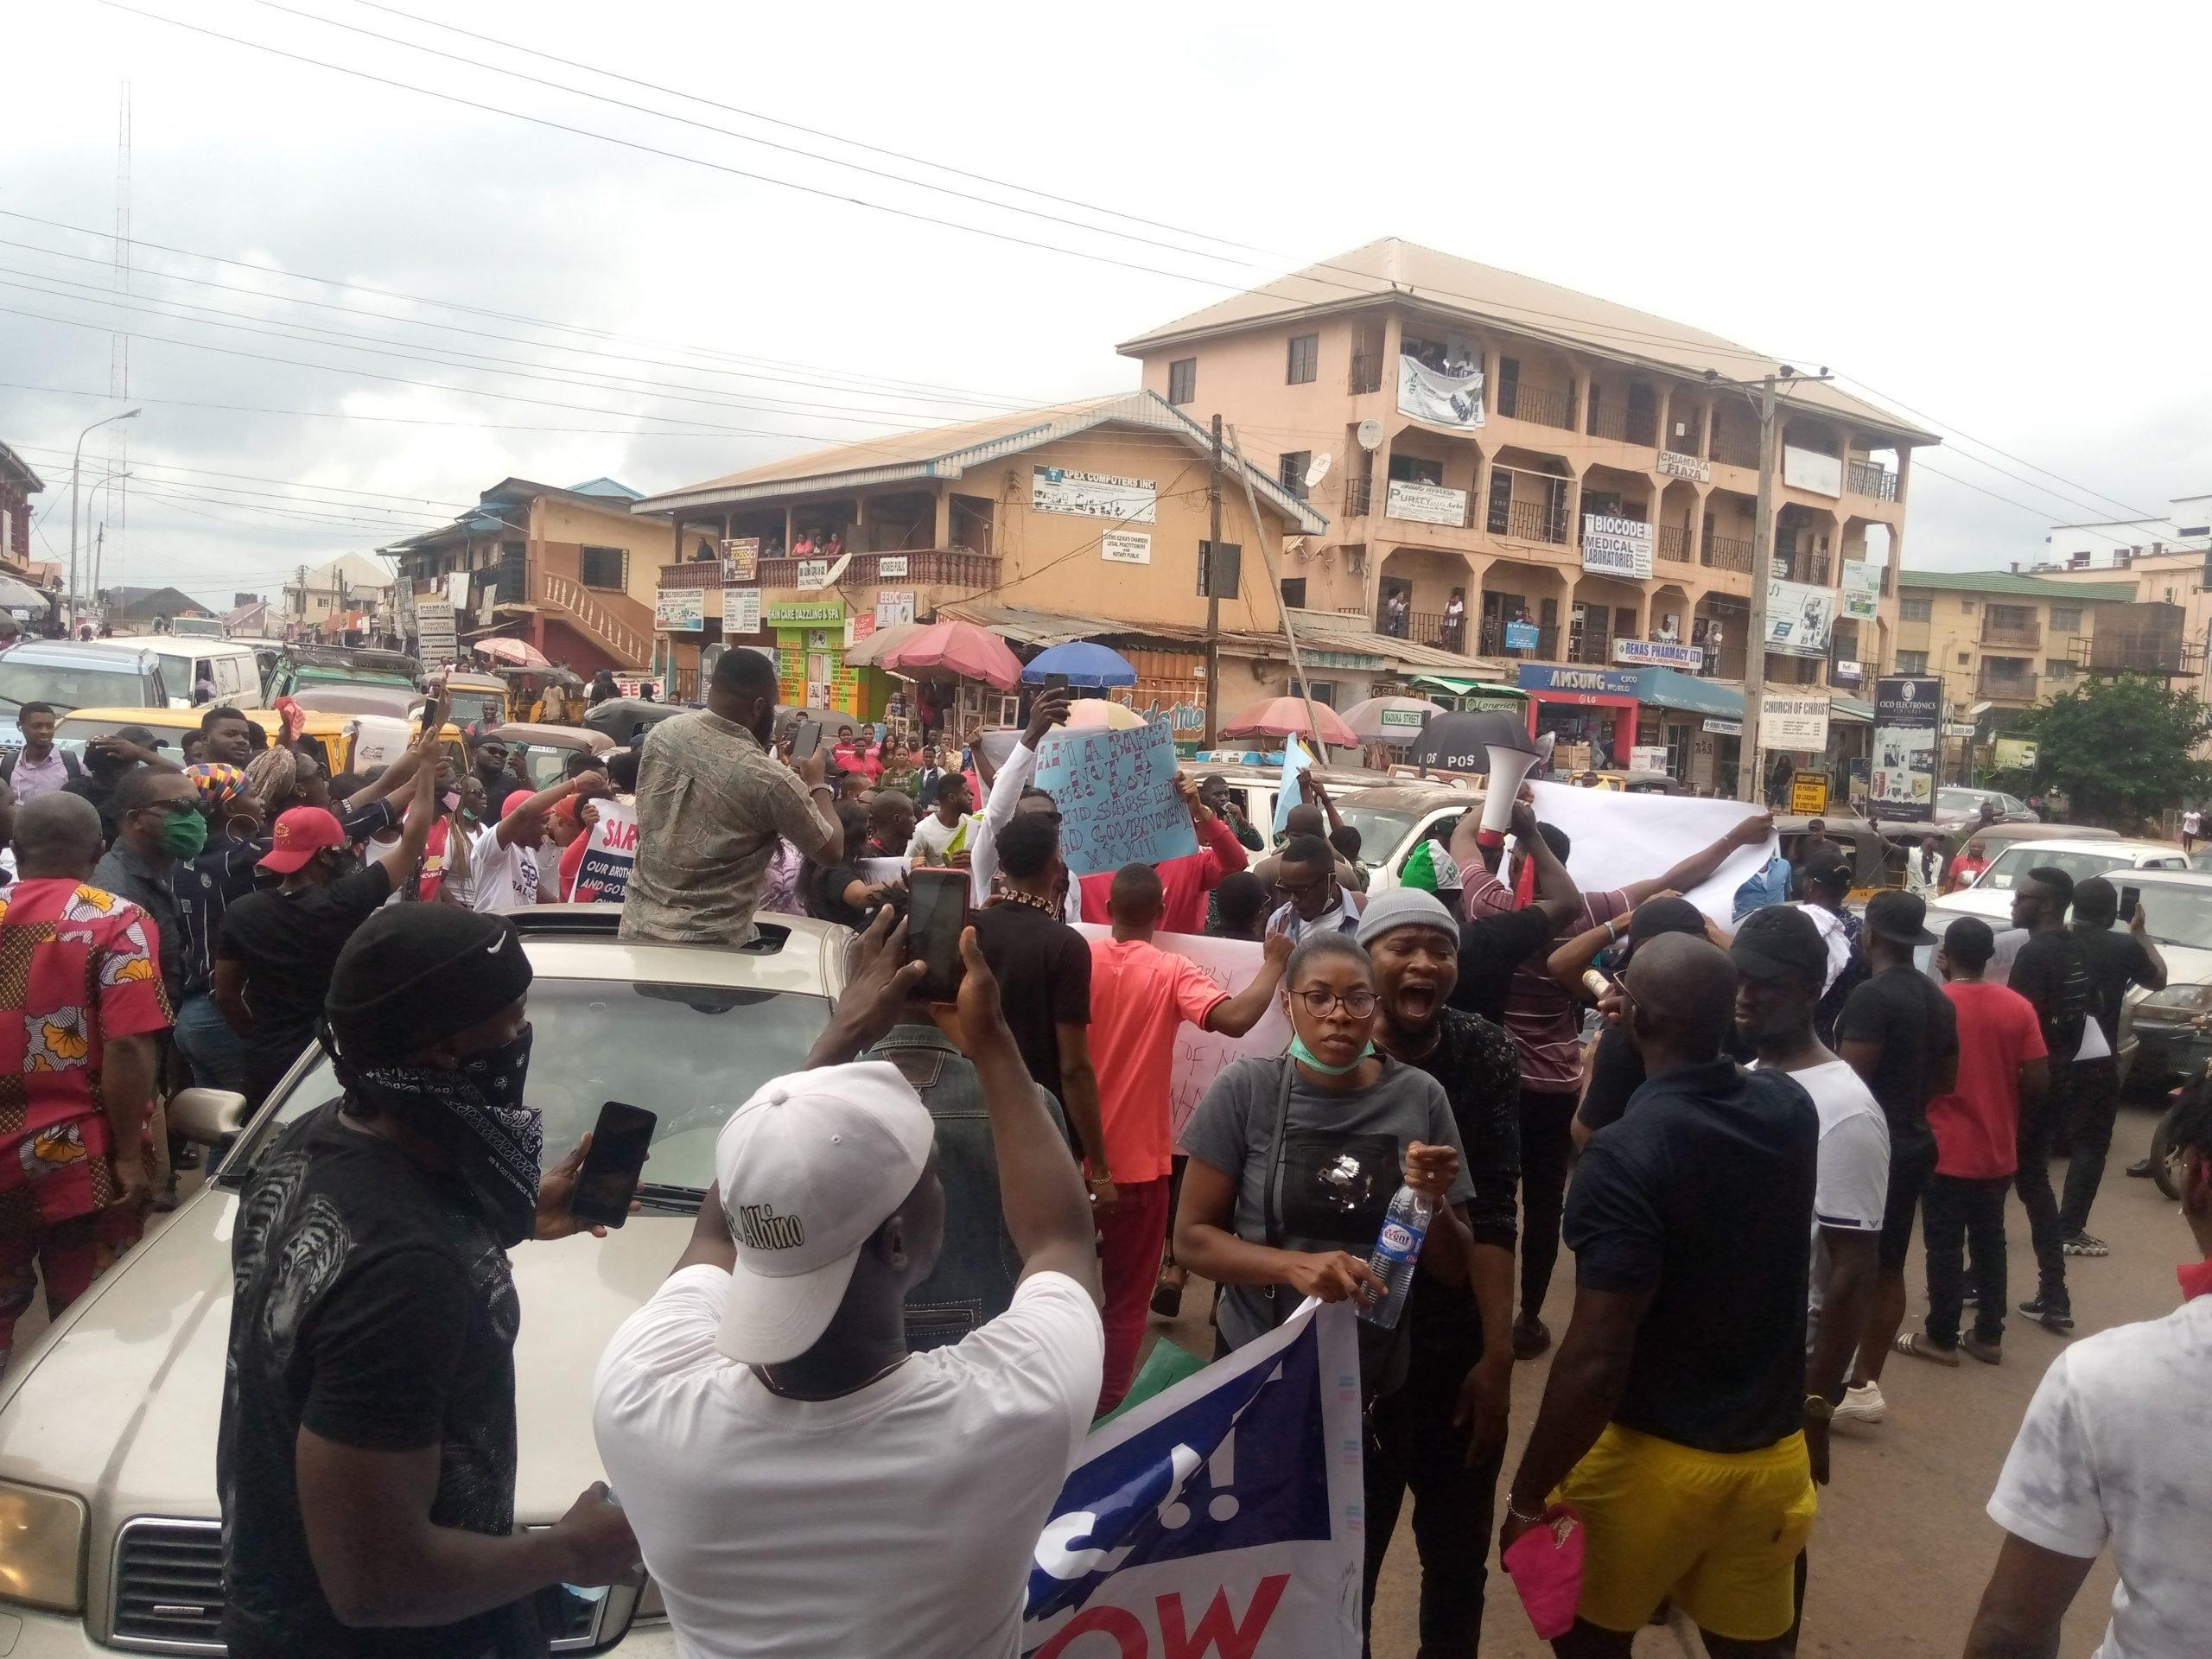 #End SARS Protesters Shuts Down Awka, Demand Prosecution Of Ex-SARS Boss, James Nwafor